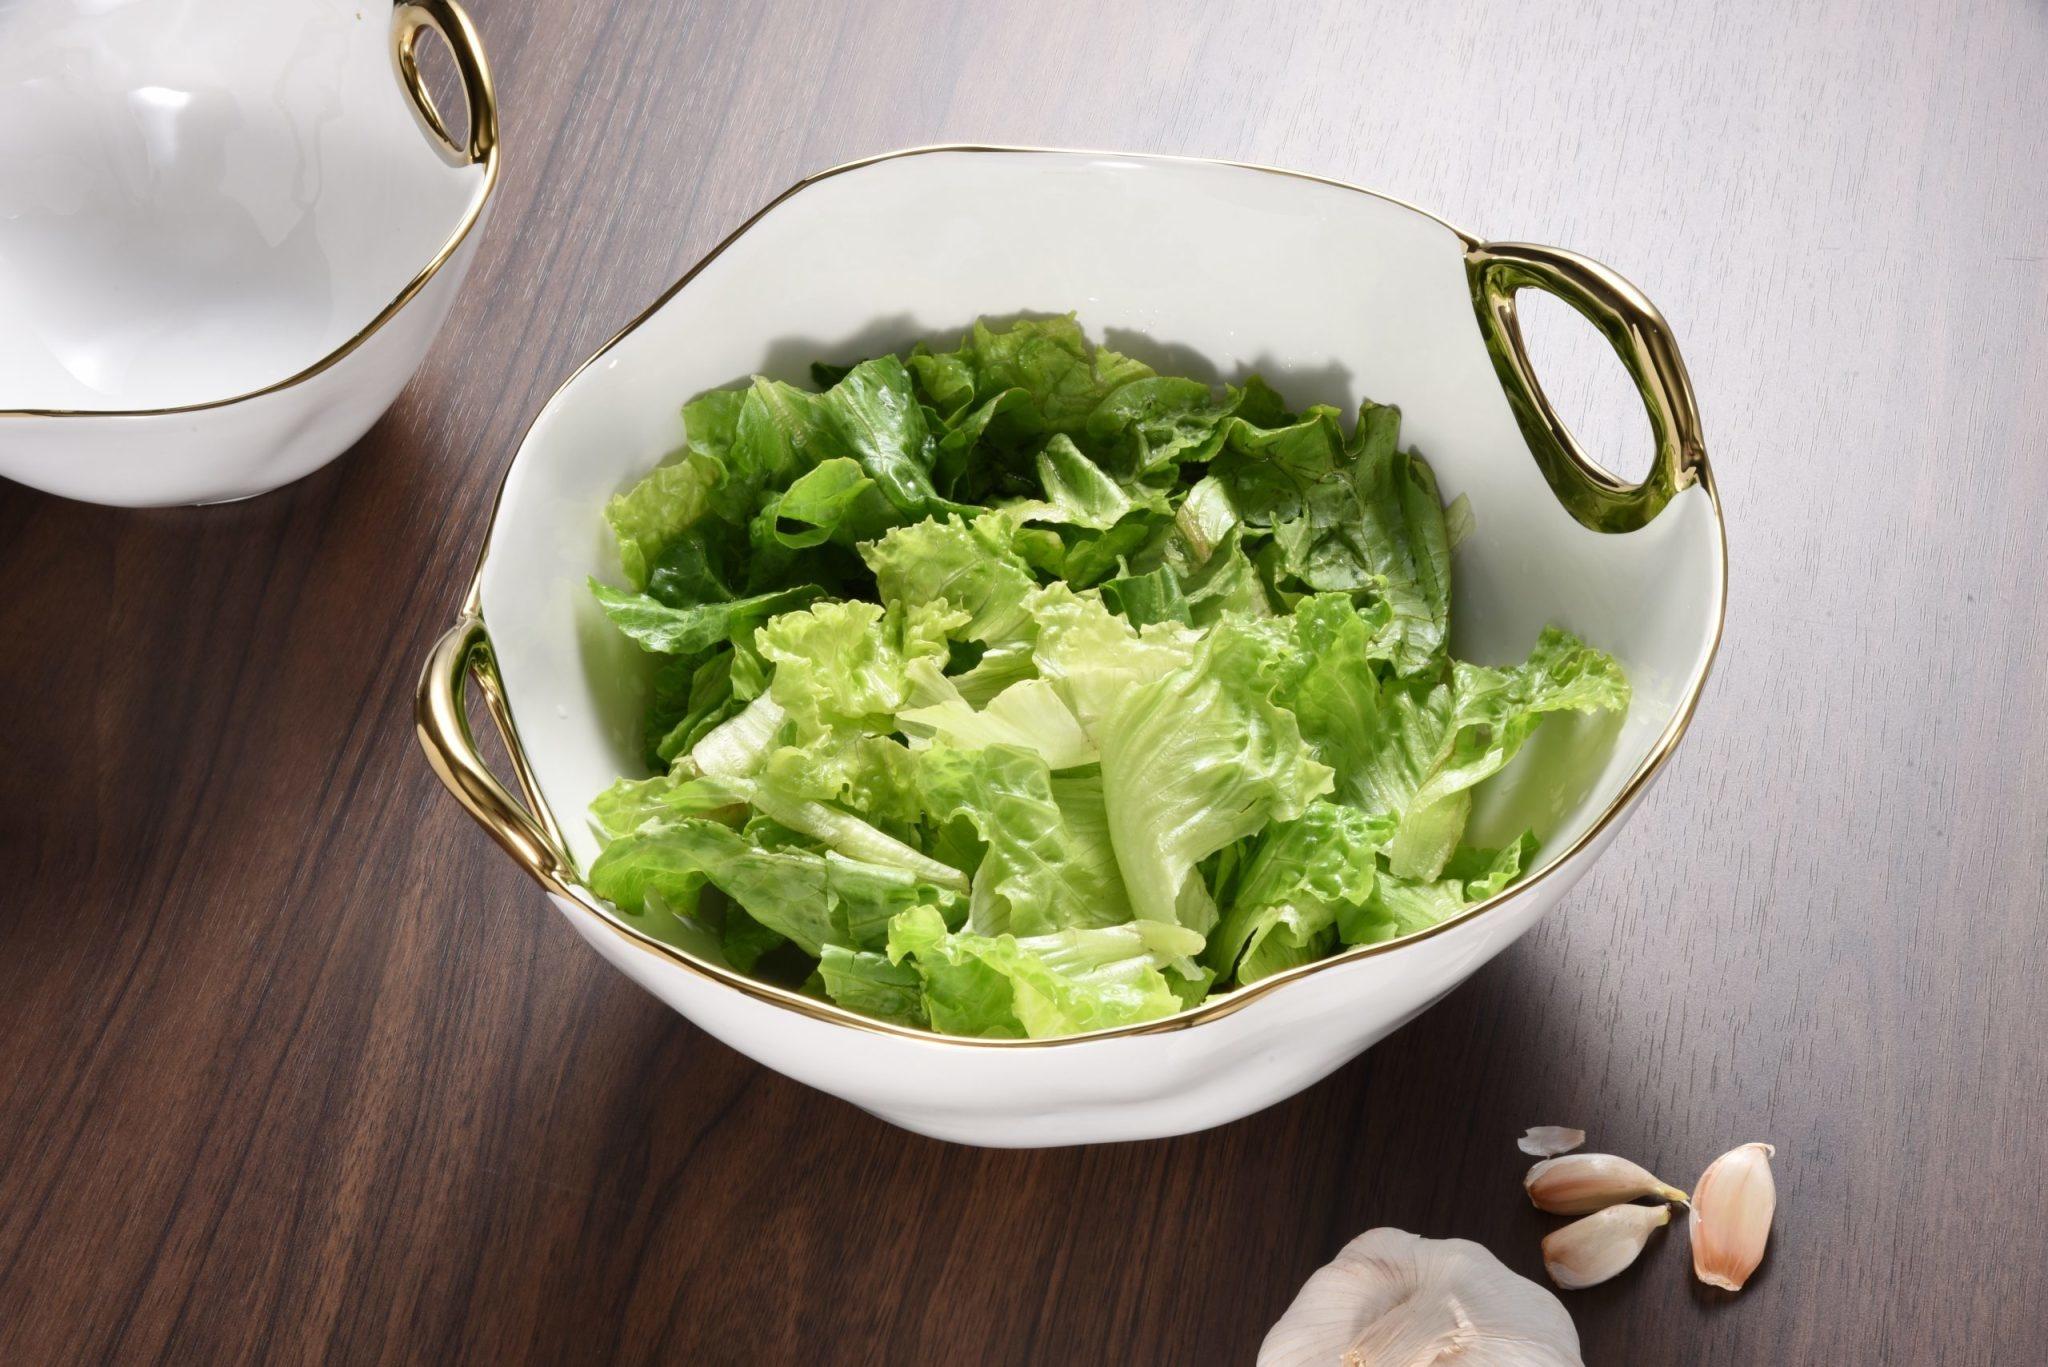 White & Gold Handle Large Bowl